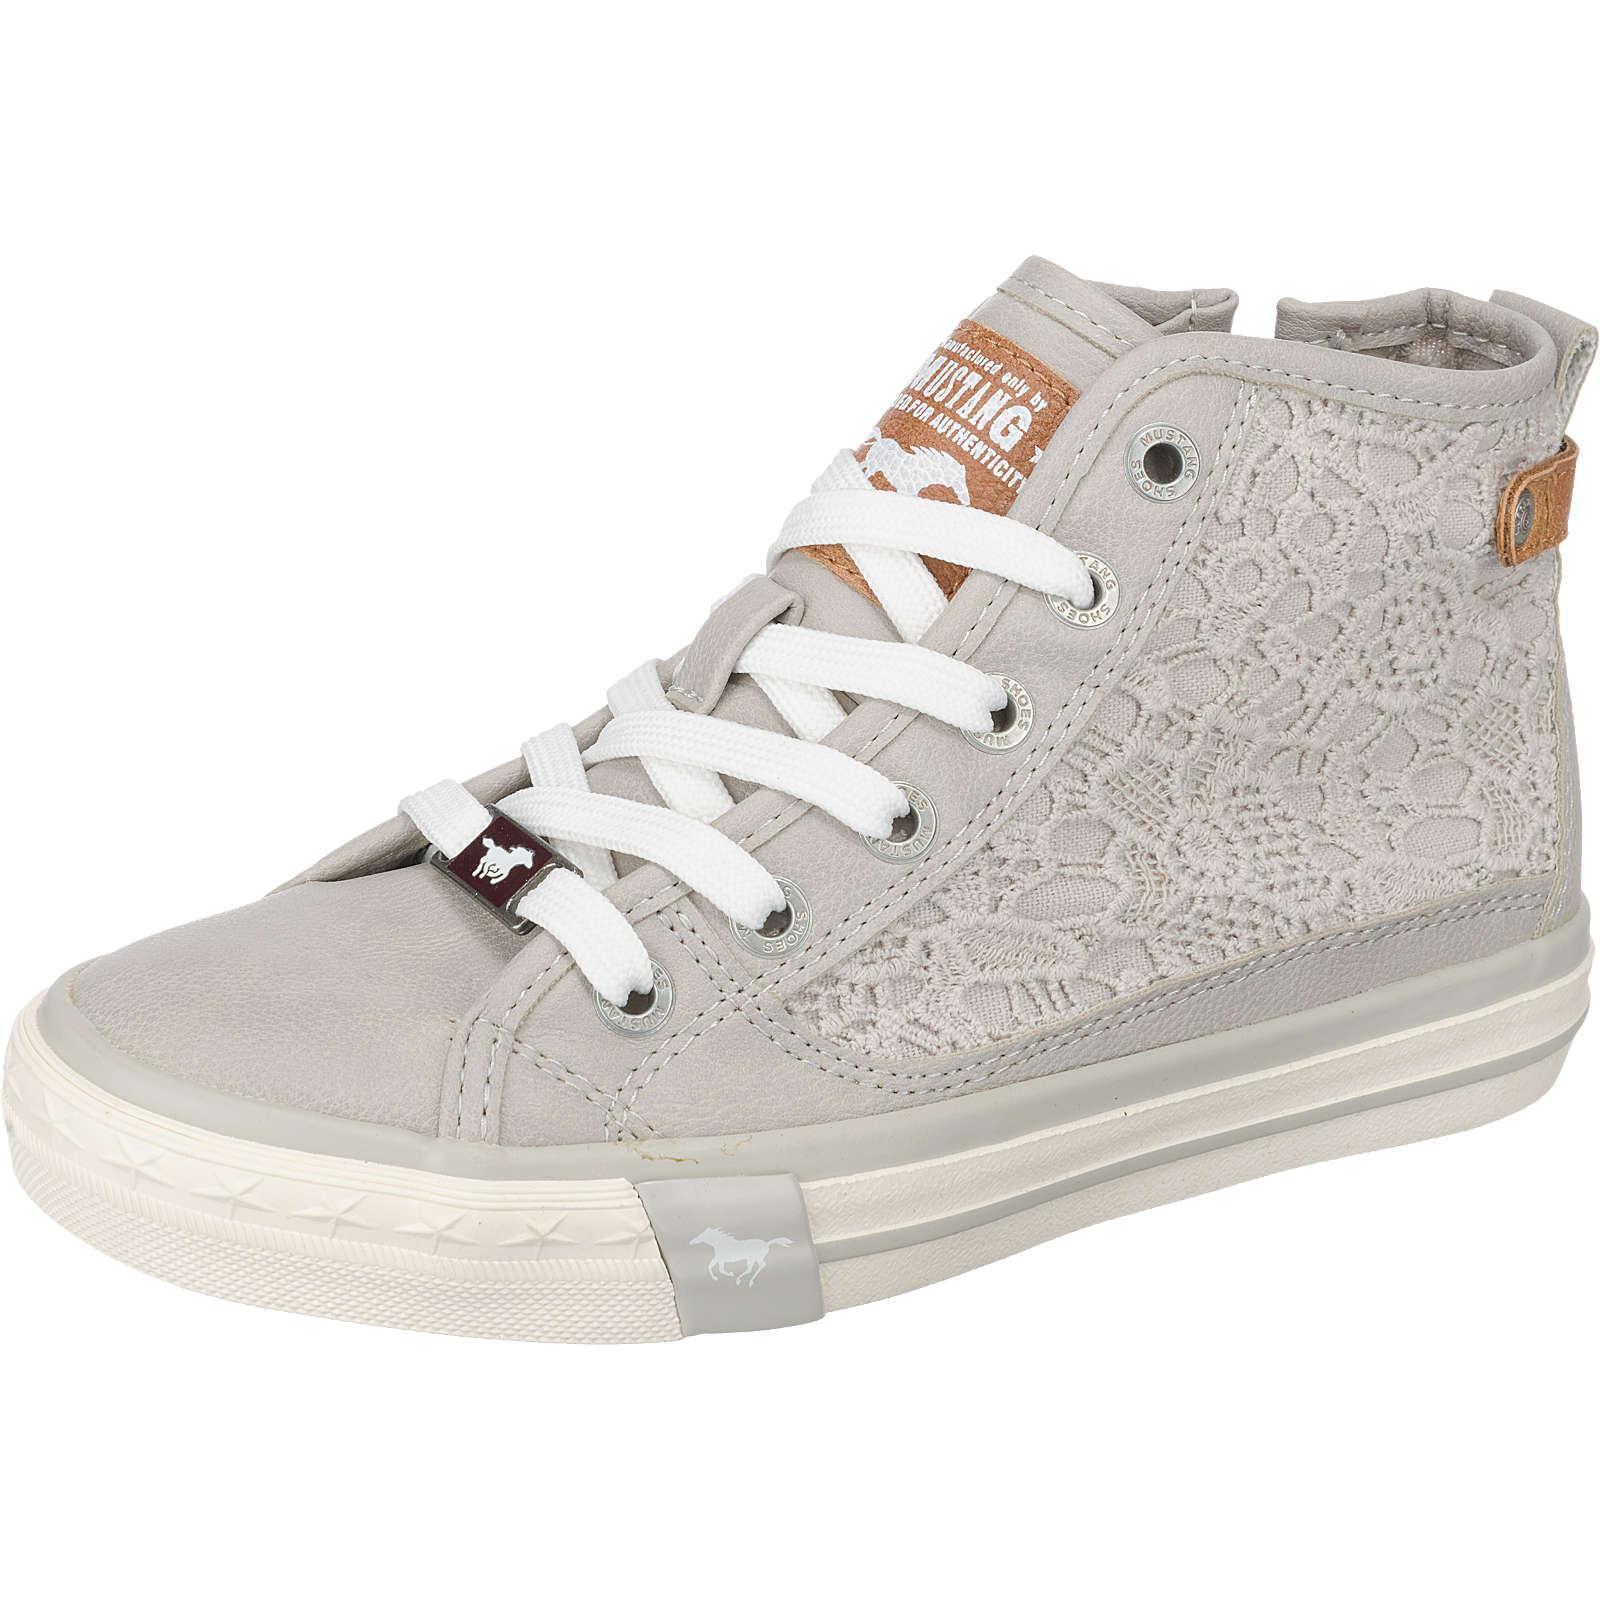 MUSTANG Sneakers High für Mädchen hellgrau Mädchen Gr. 36